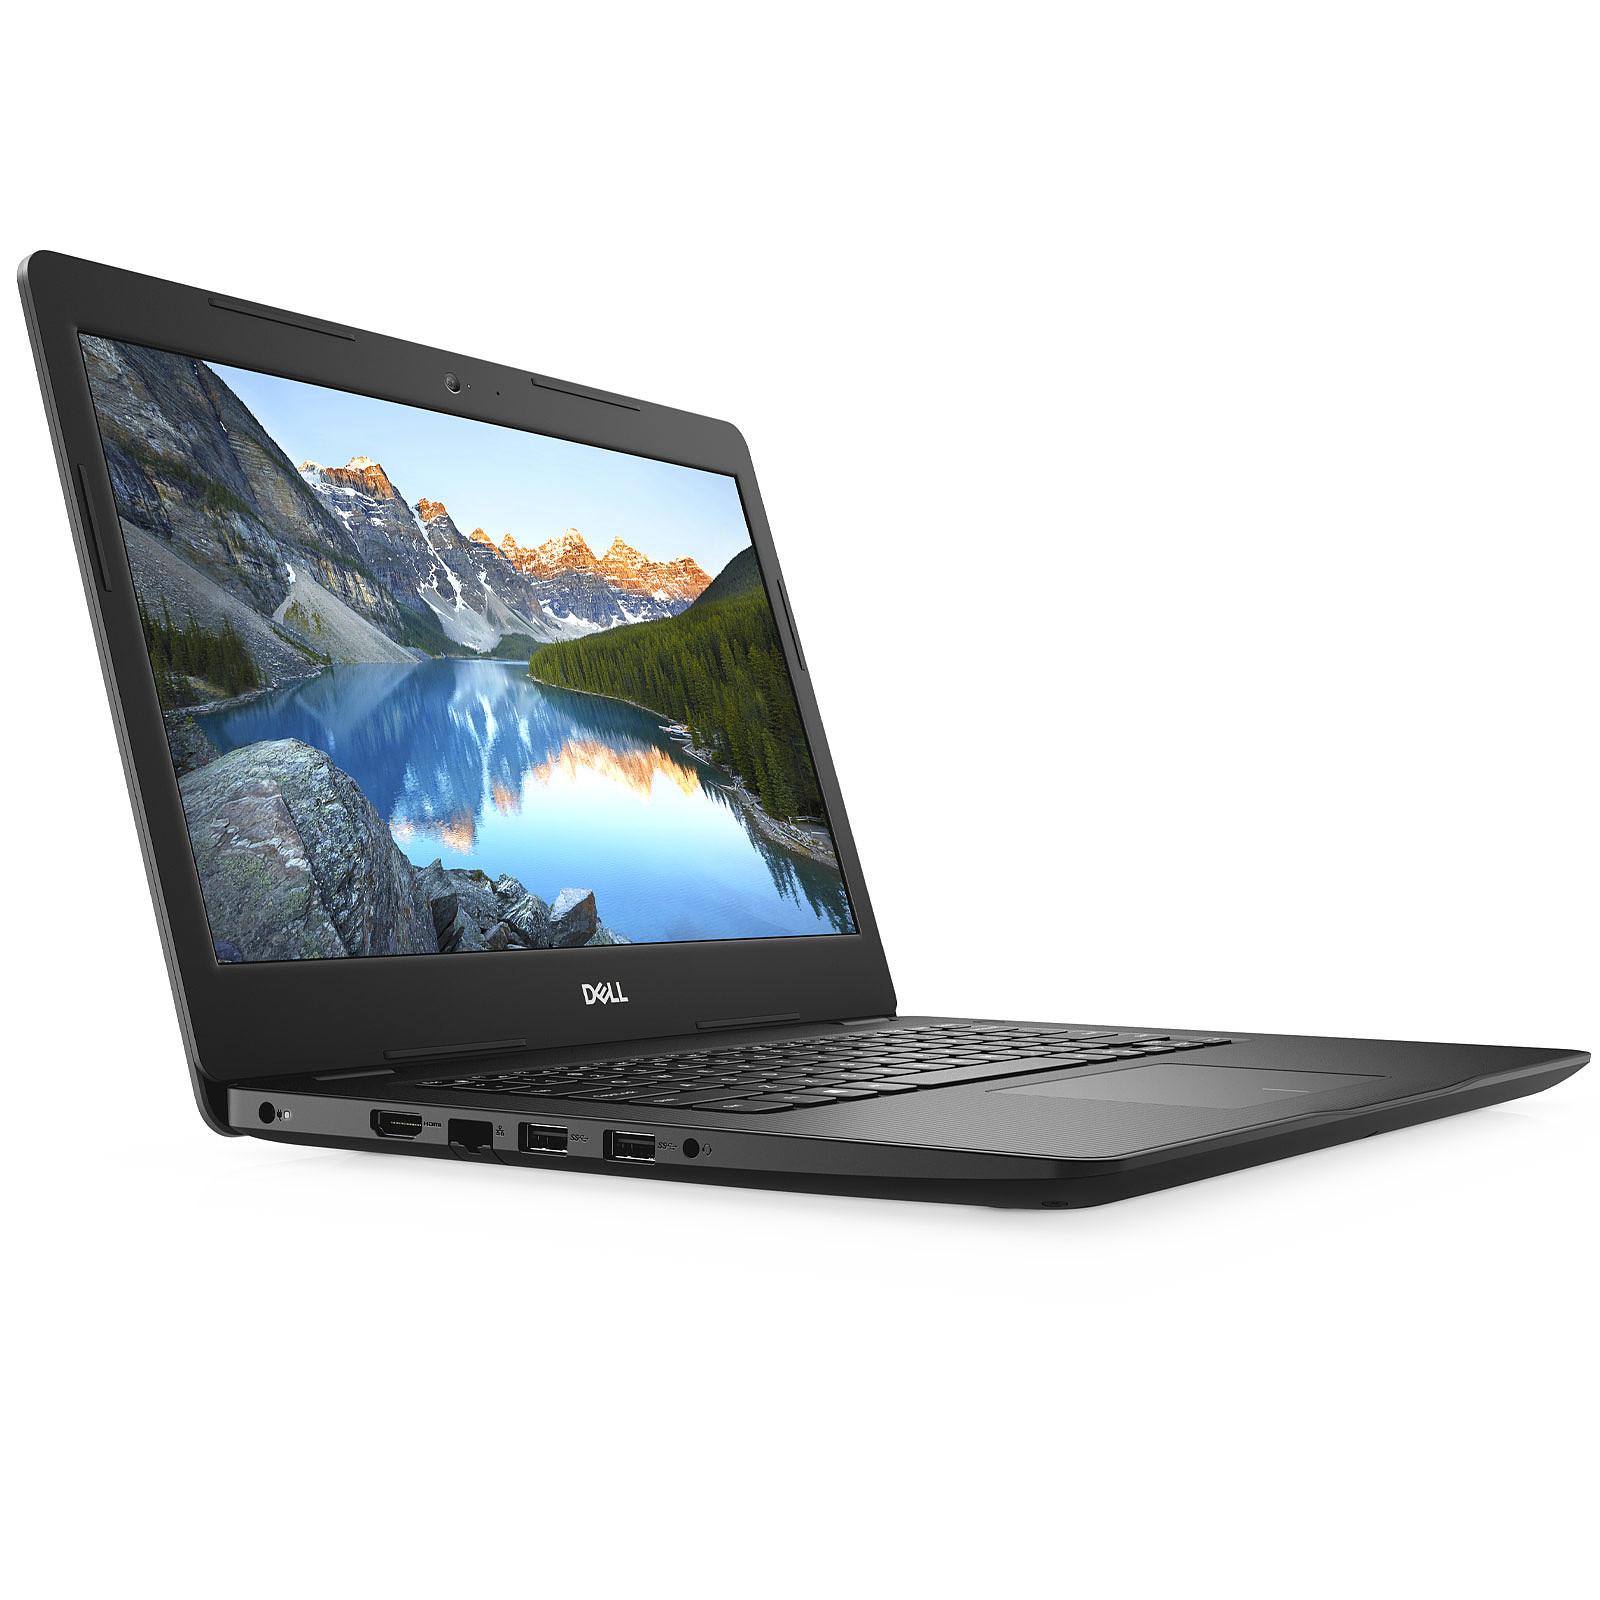 Dell Inspiron 14 3480 (XTVXG)